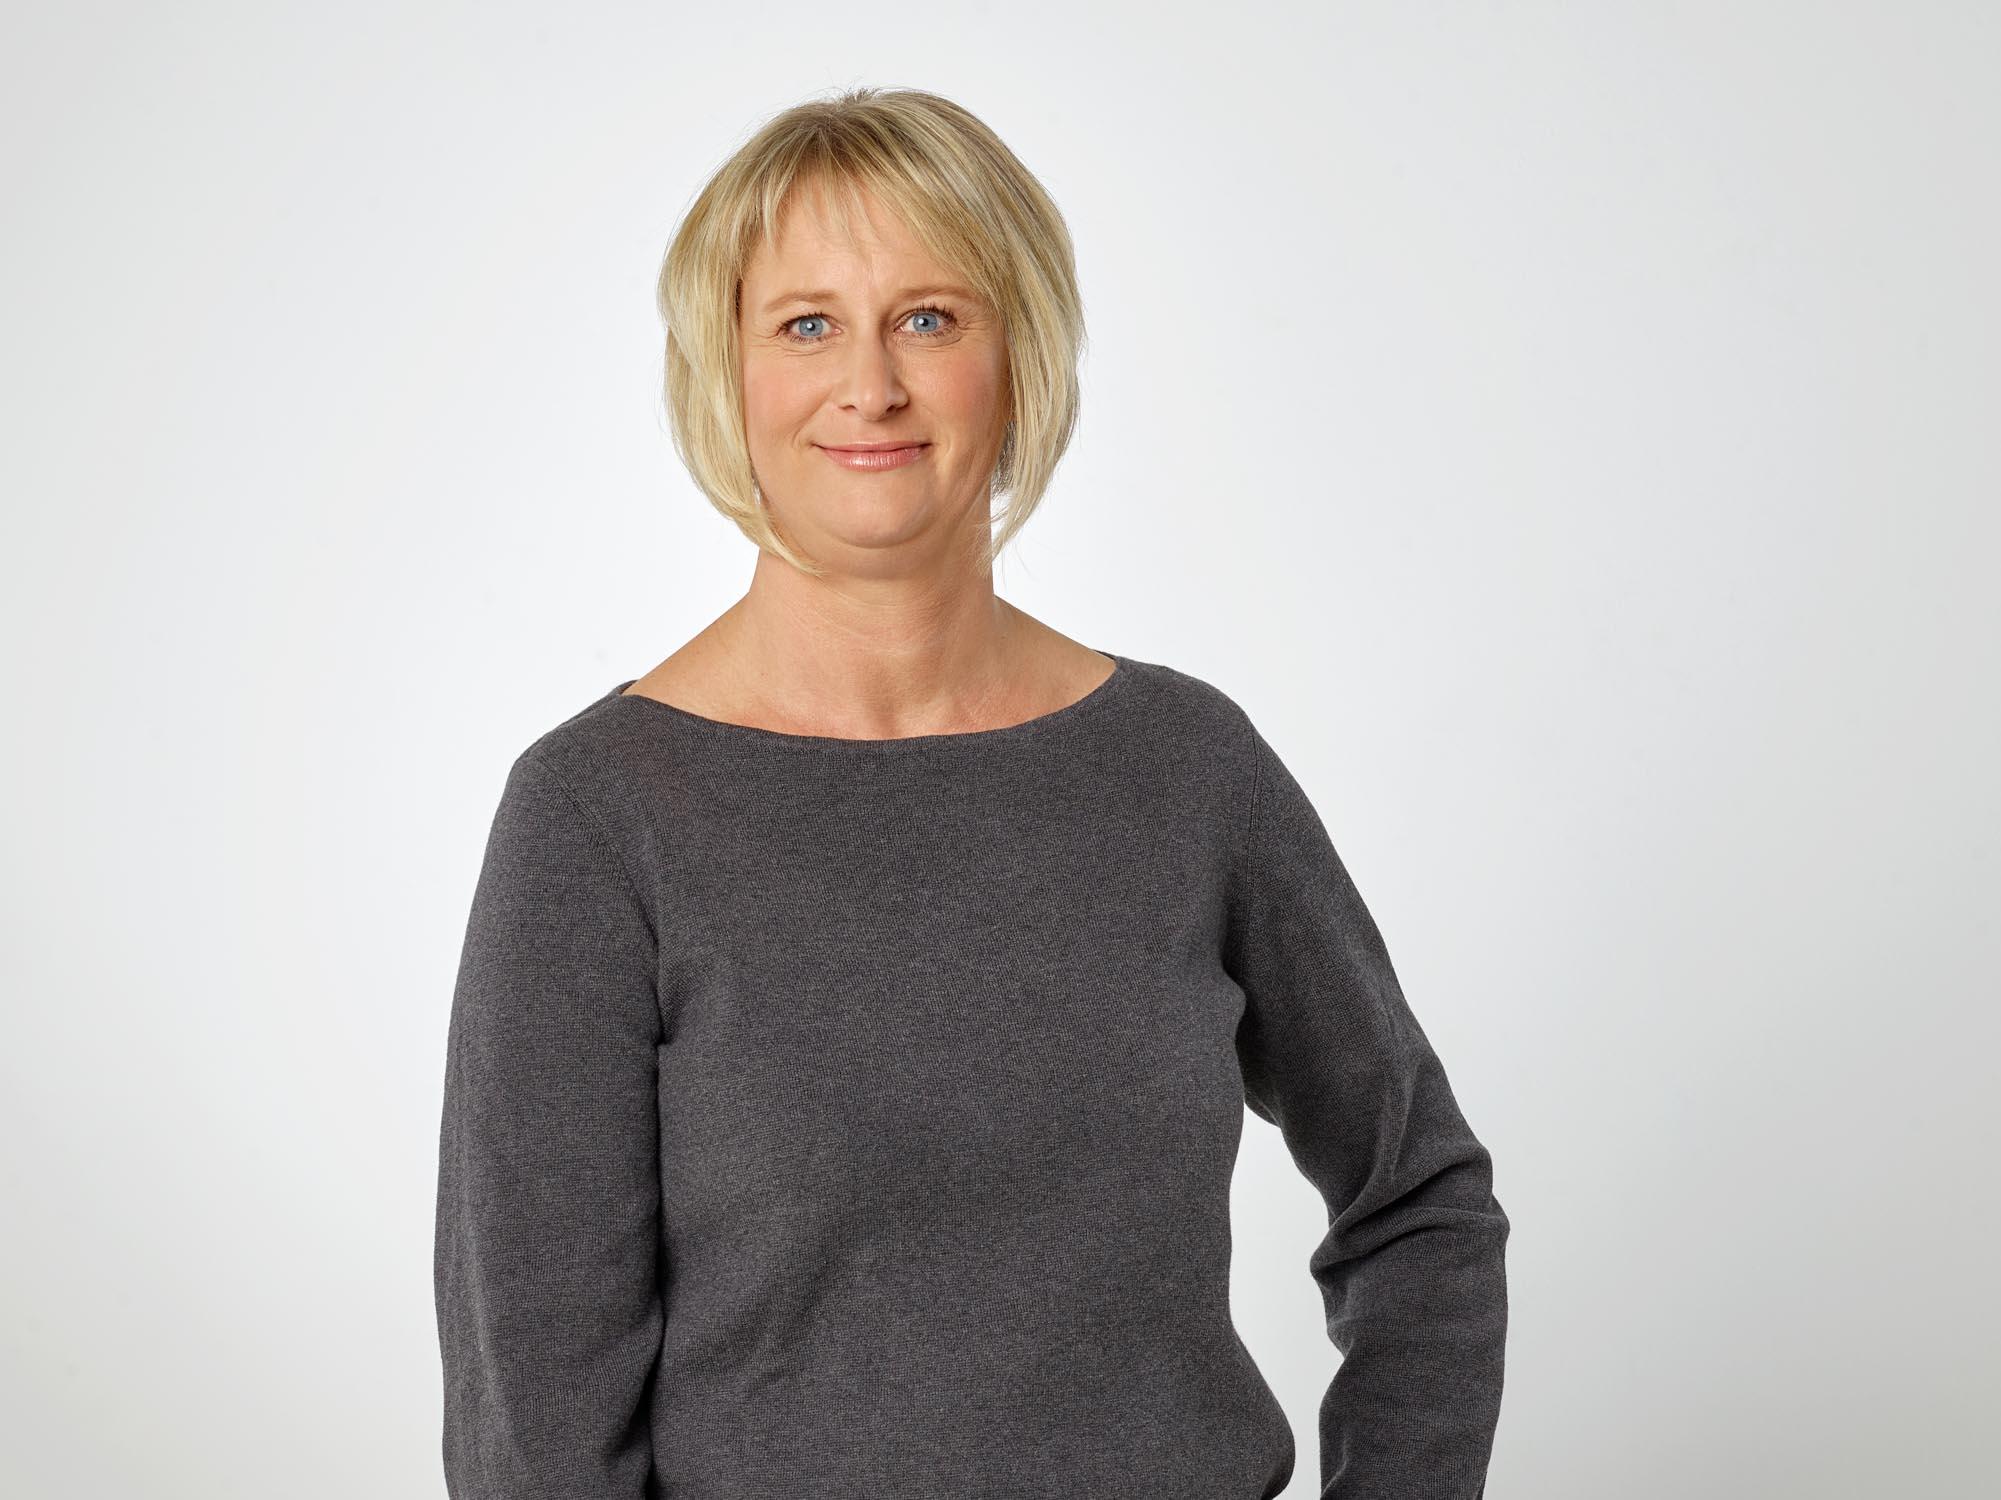 Simone Kaltschmid